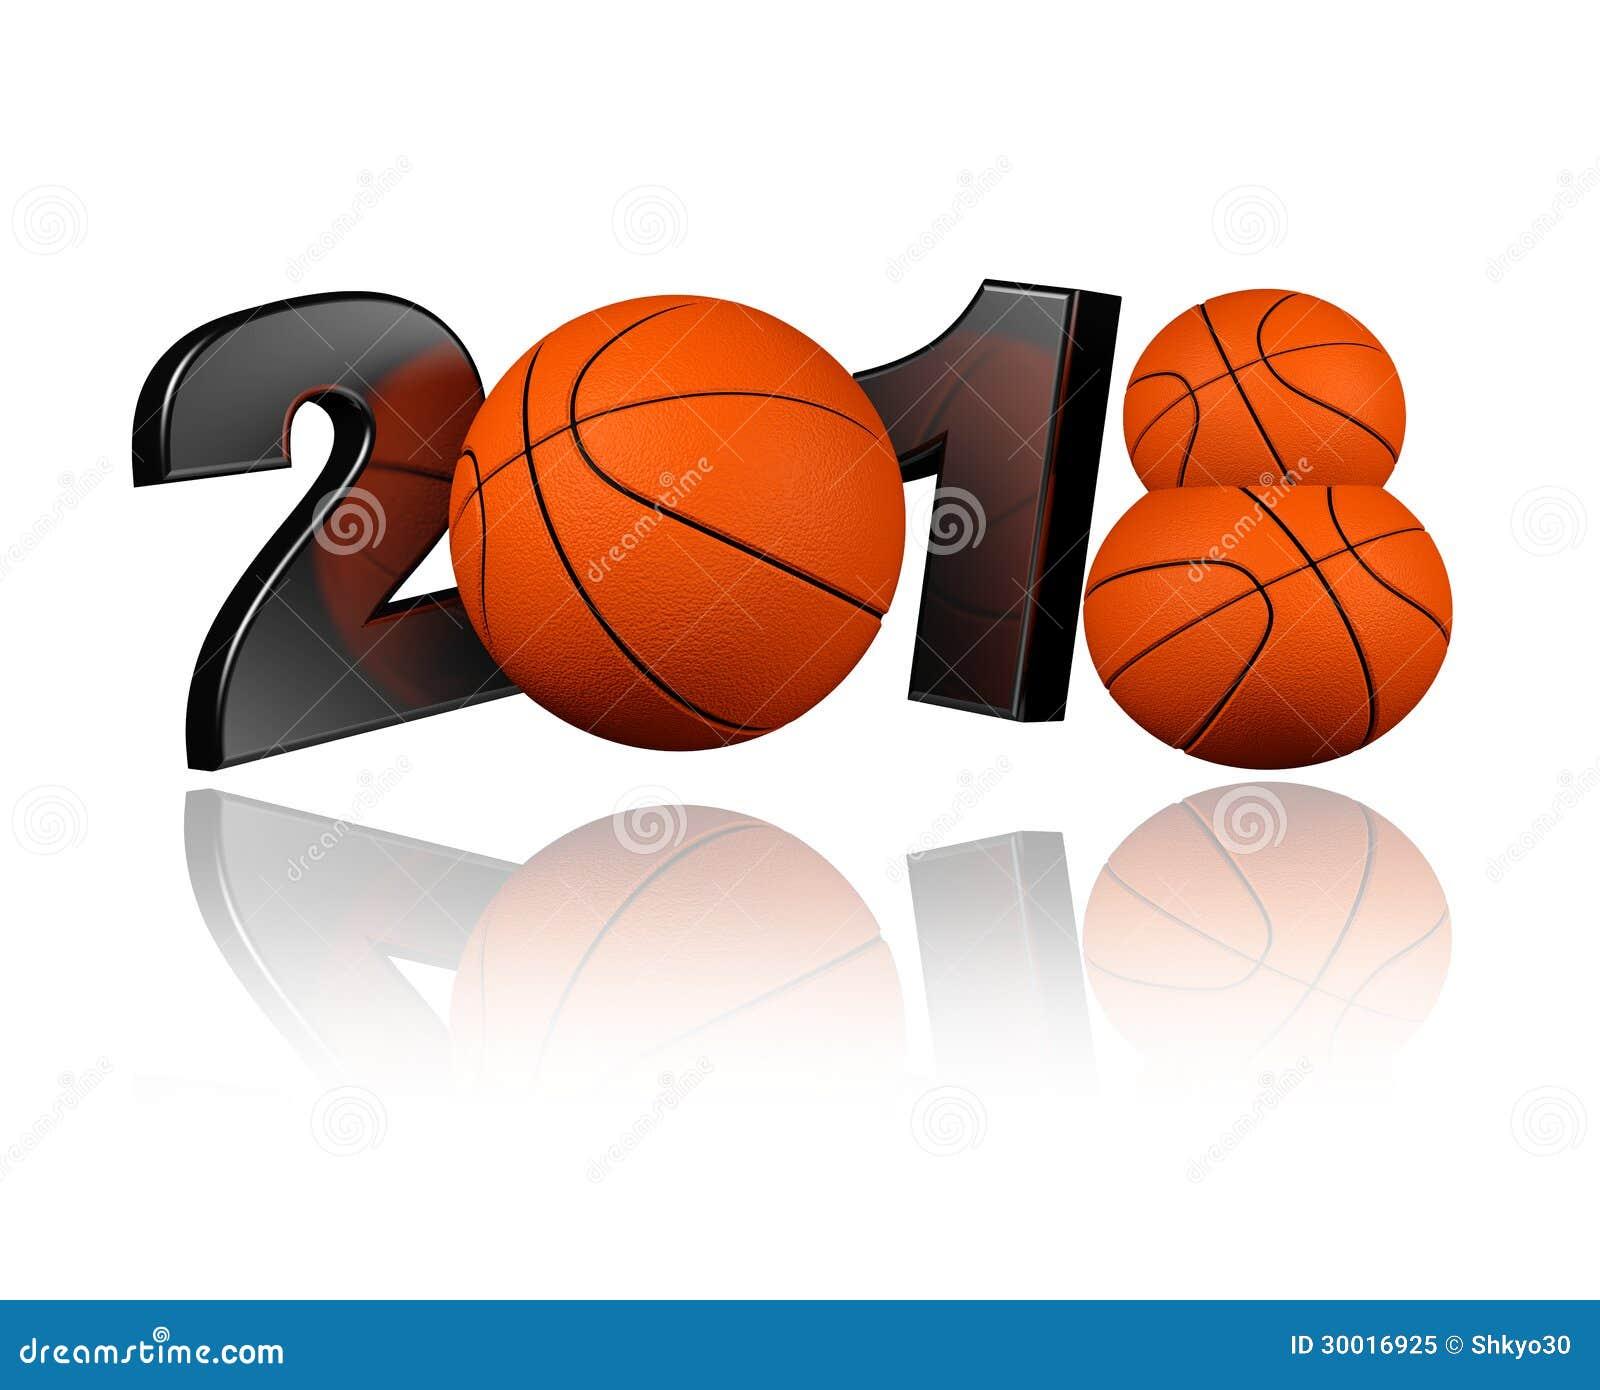 Basketball 2018 Royalty Free Stock Photo - Image: 30016925